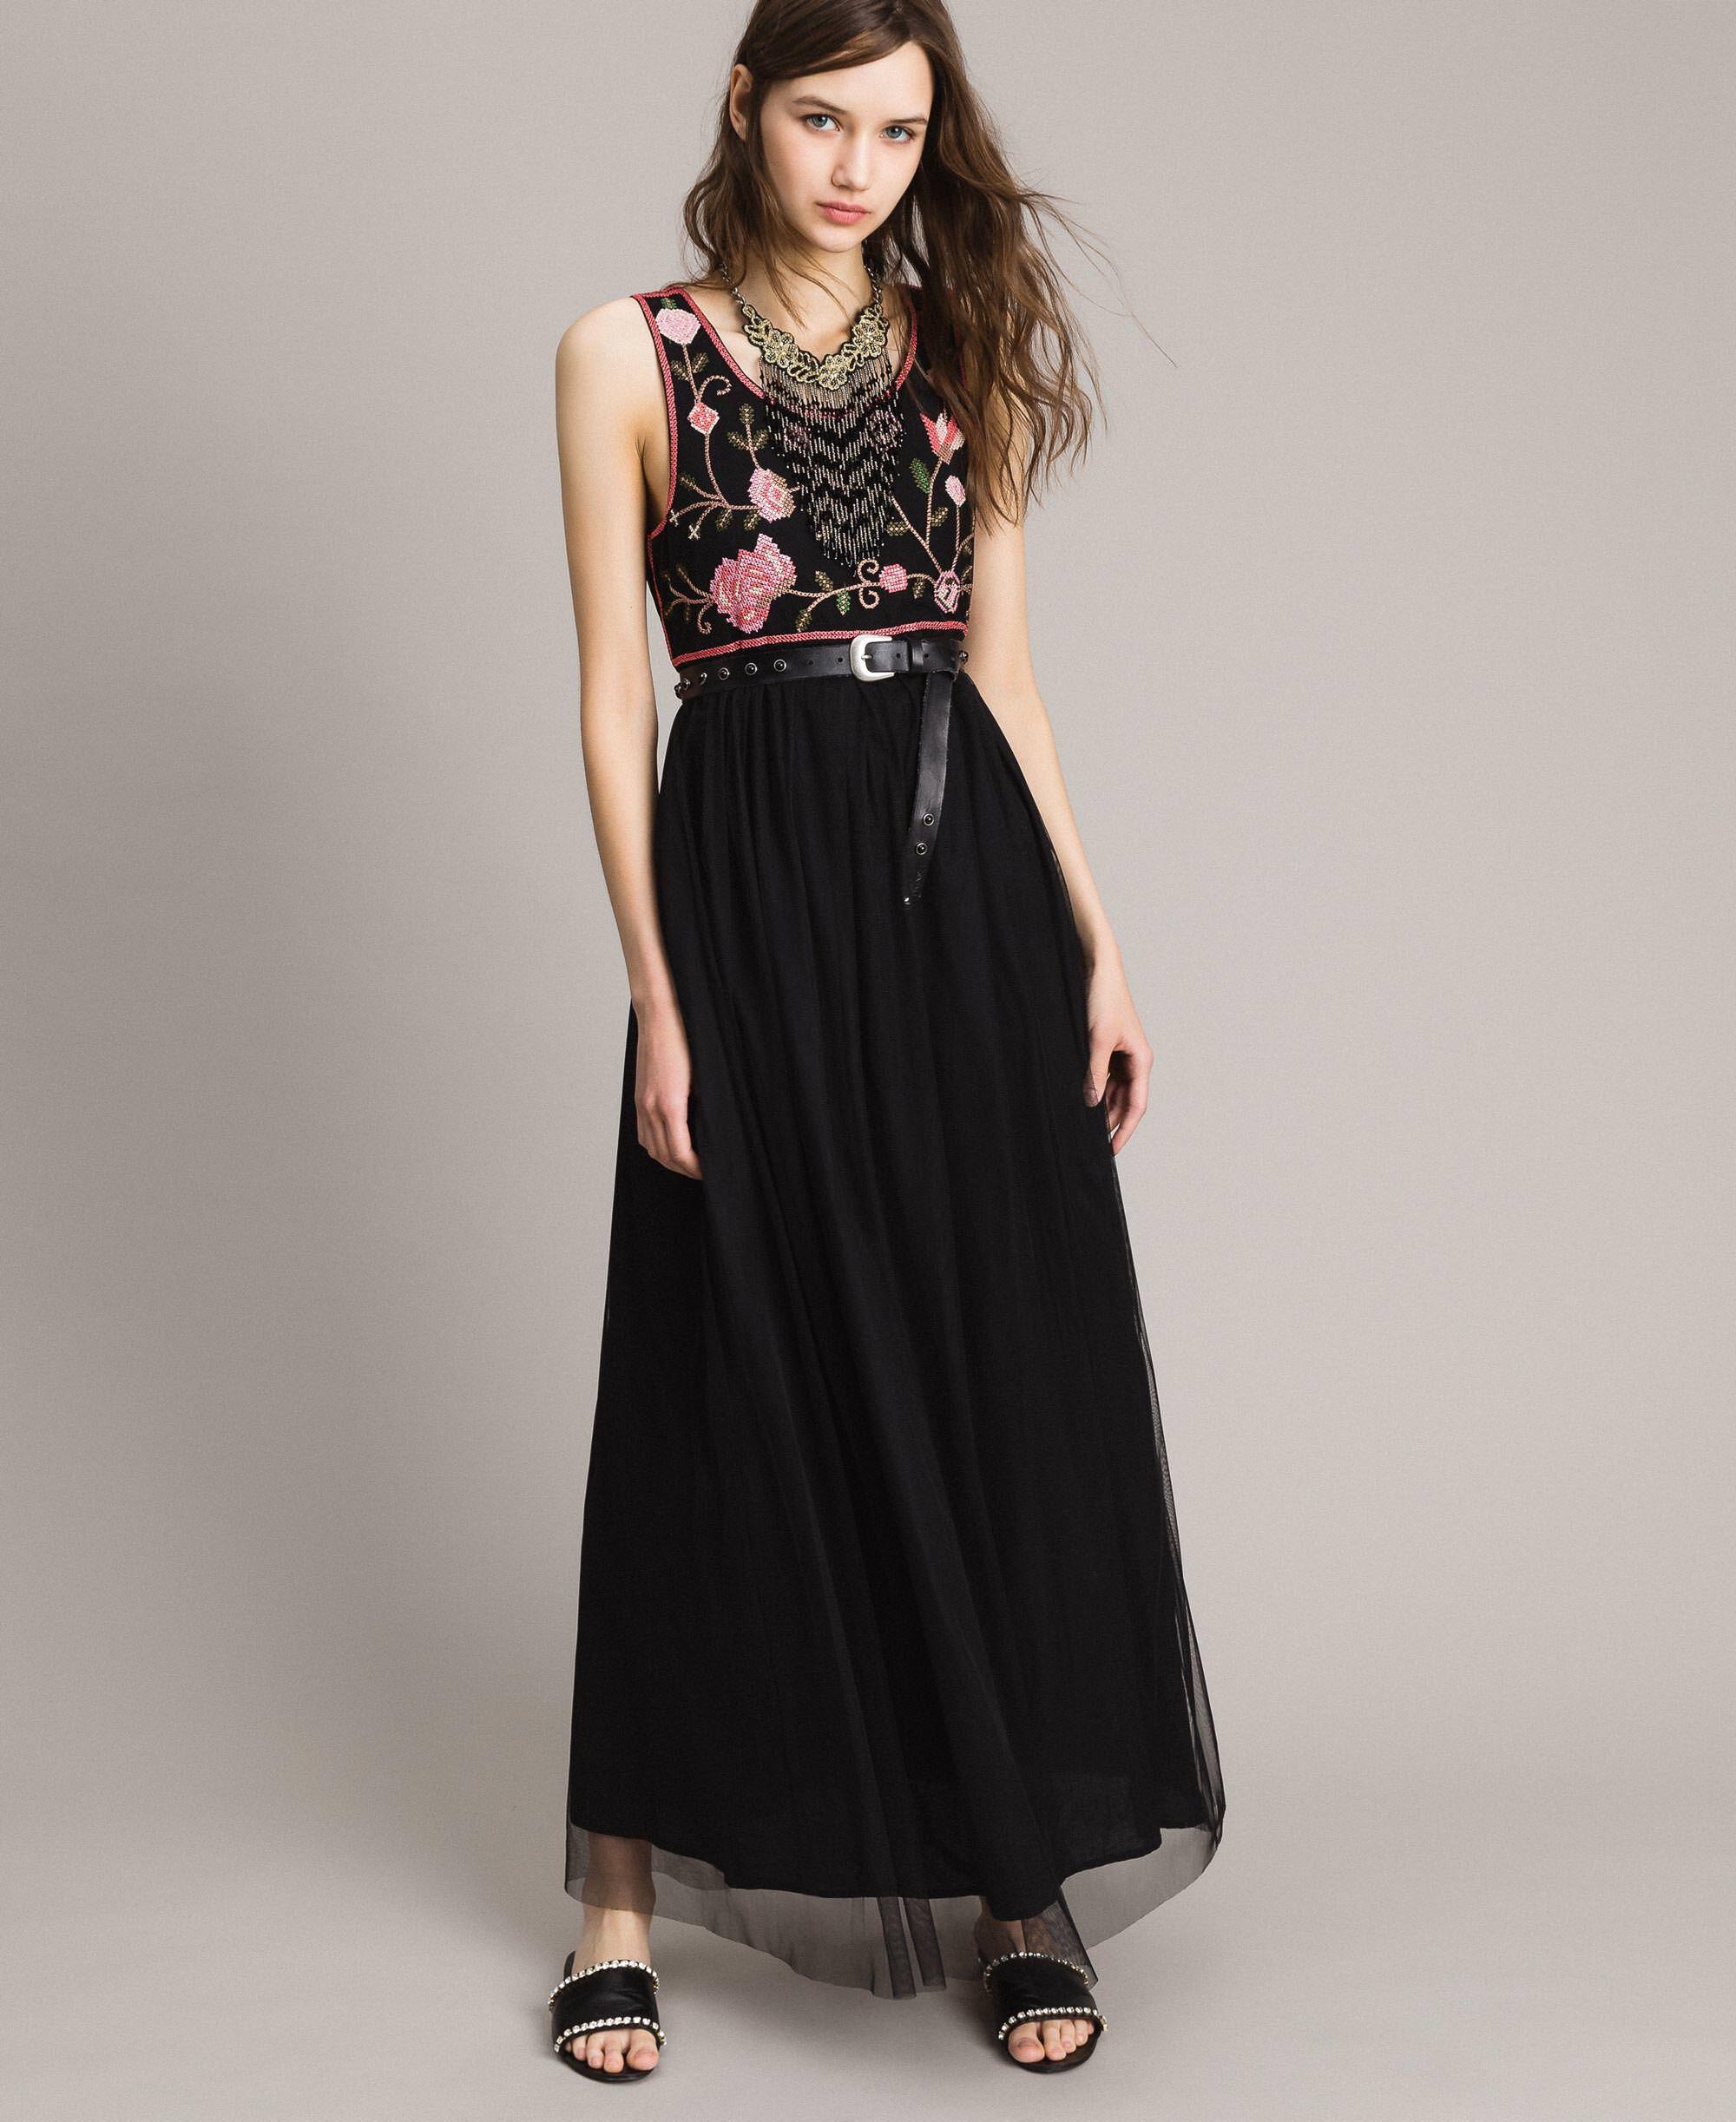 Vestido negro bordado mujer